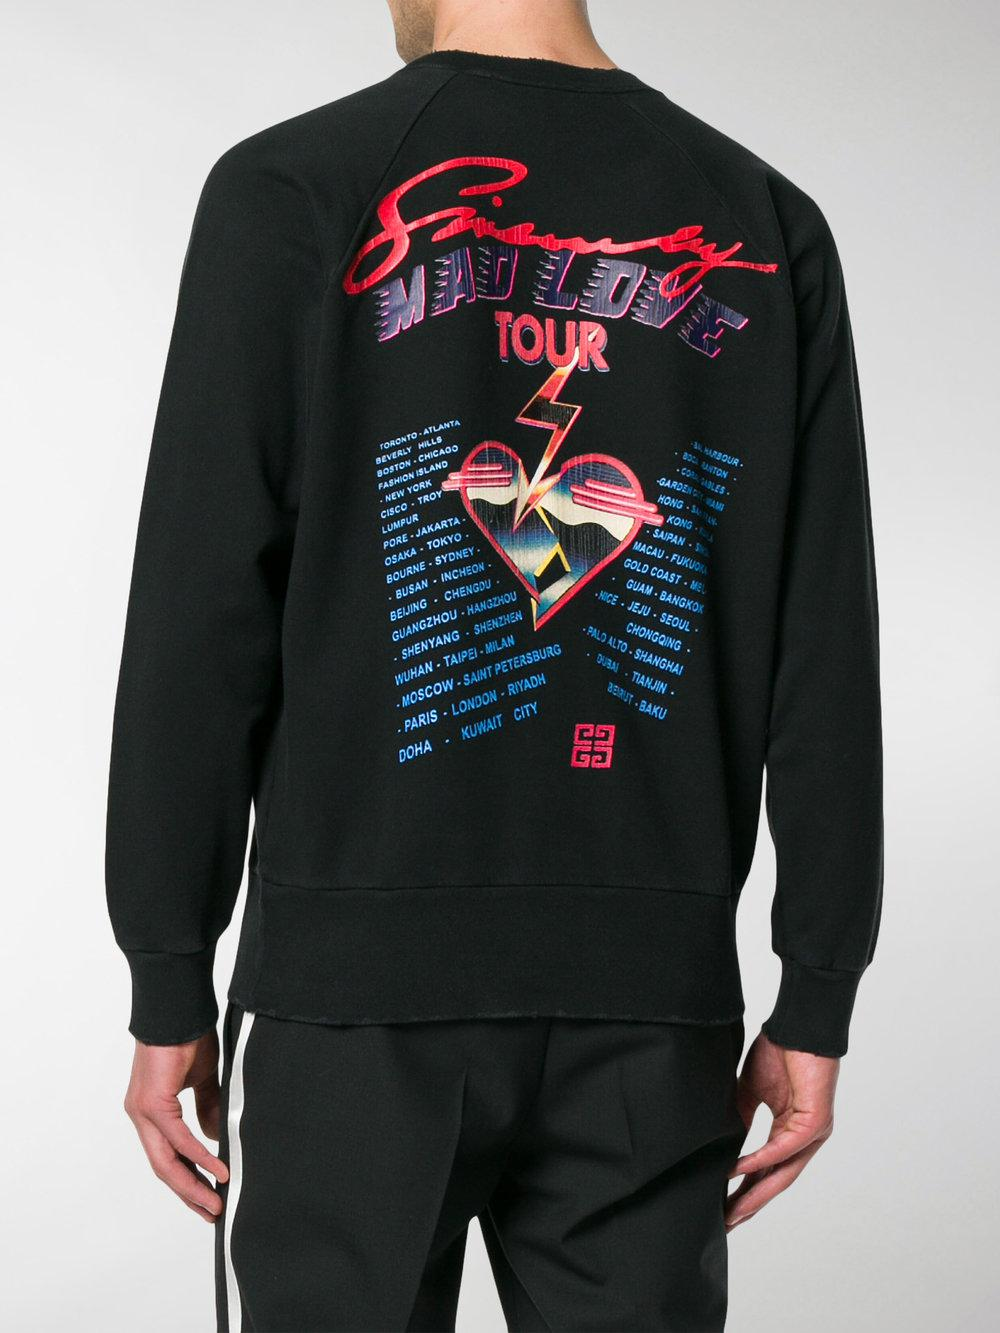 Givenchy Cotton Lightning Bolt Arrow Sweatshirt in Black for Men